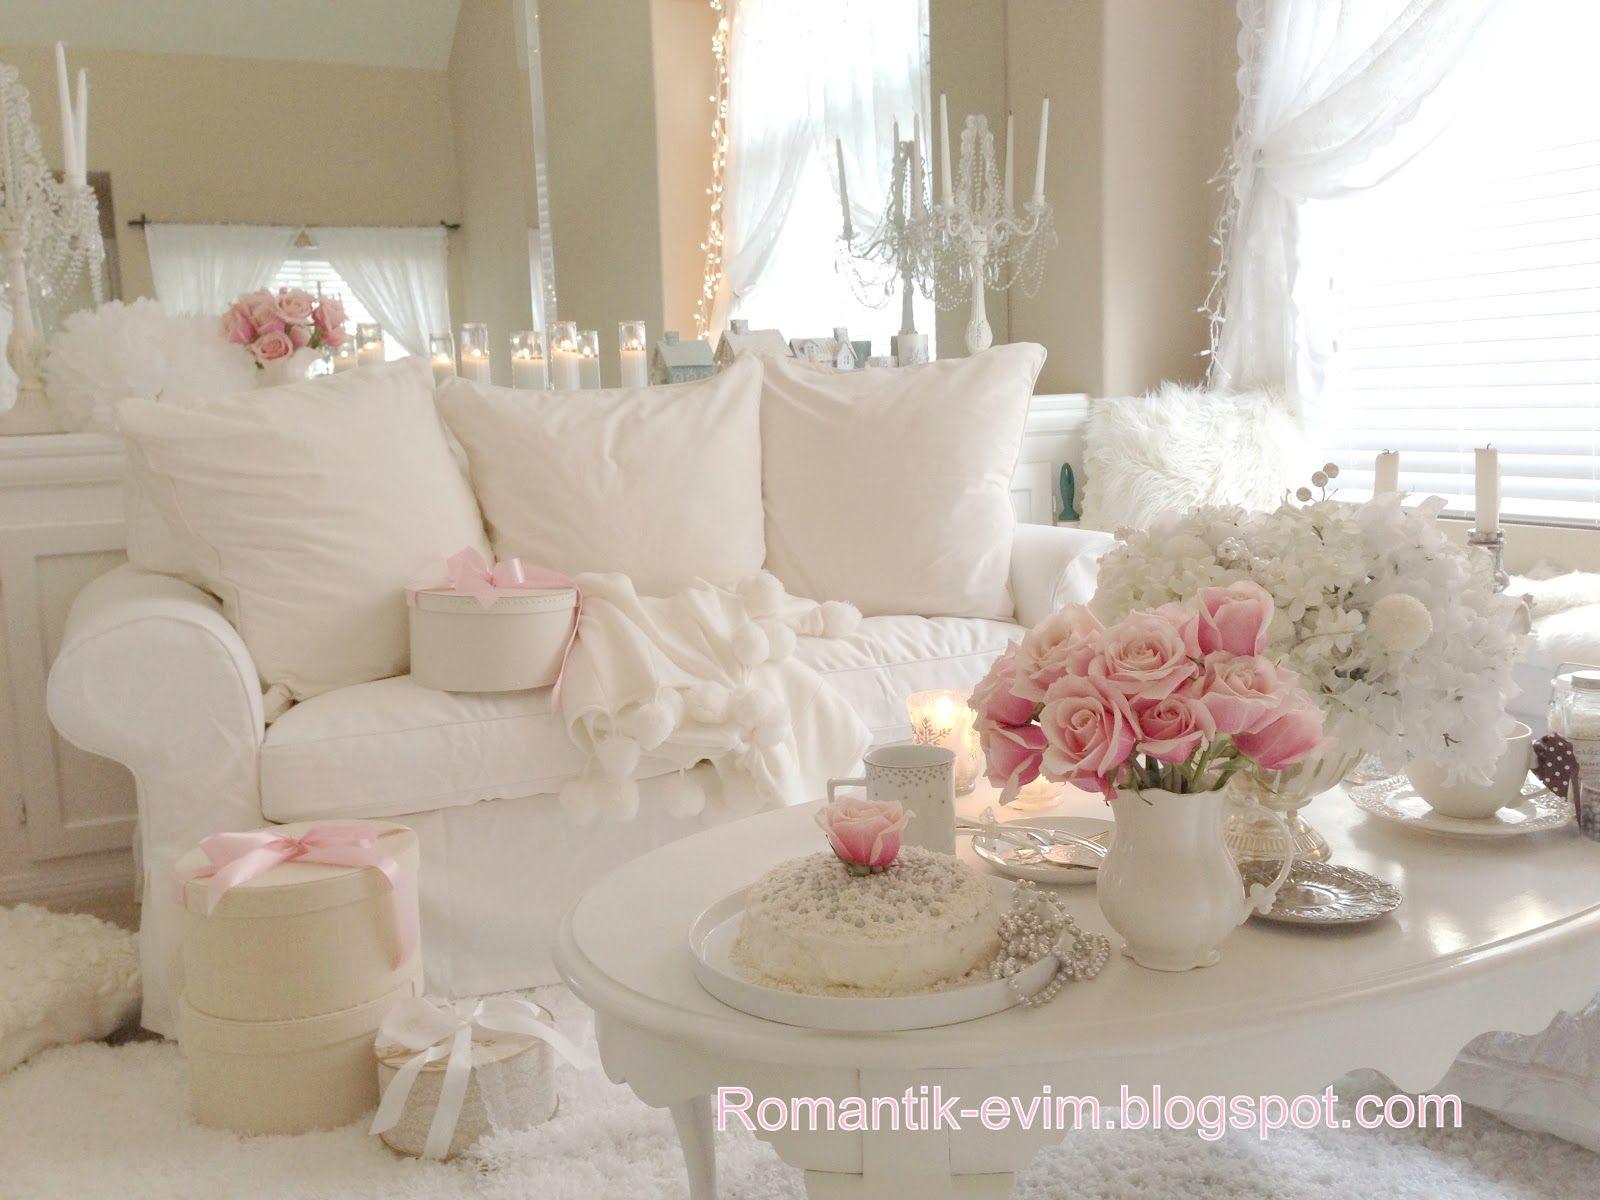 Romantic Shabby Chic Decorating Ideas   romantic shabby chic blog ...